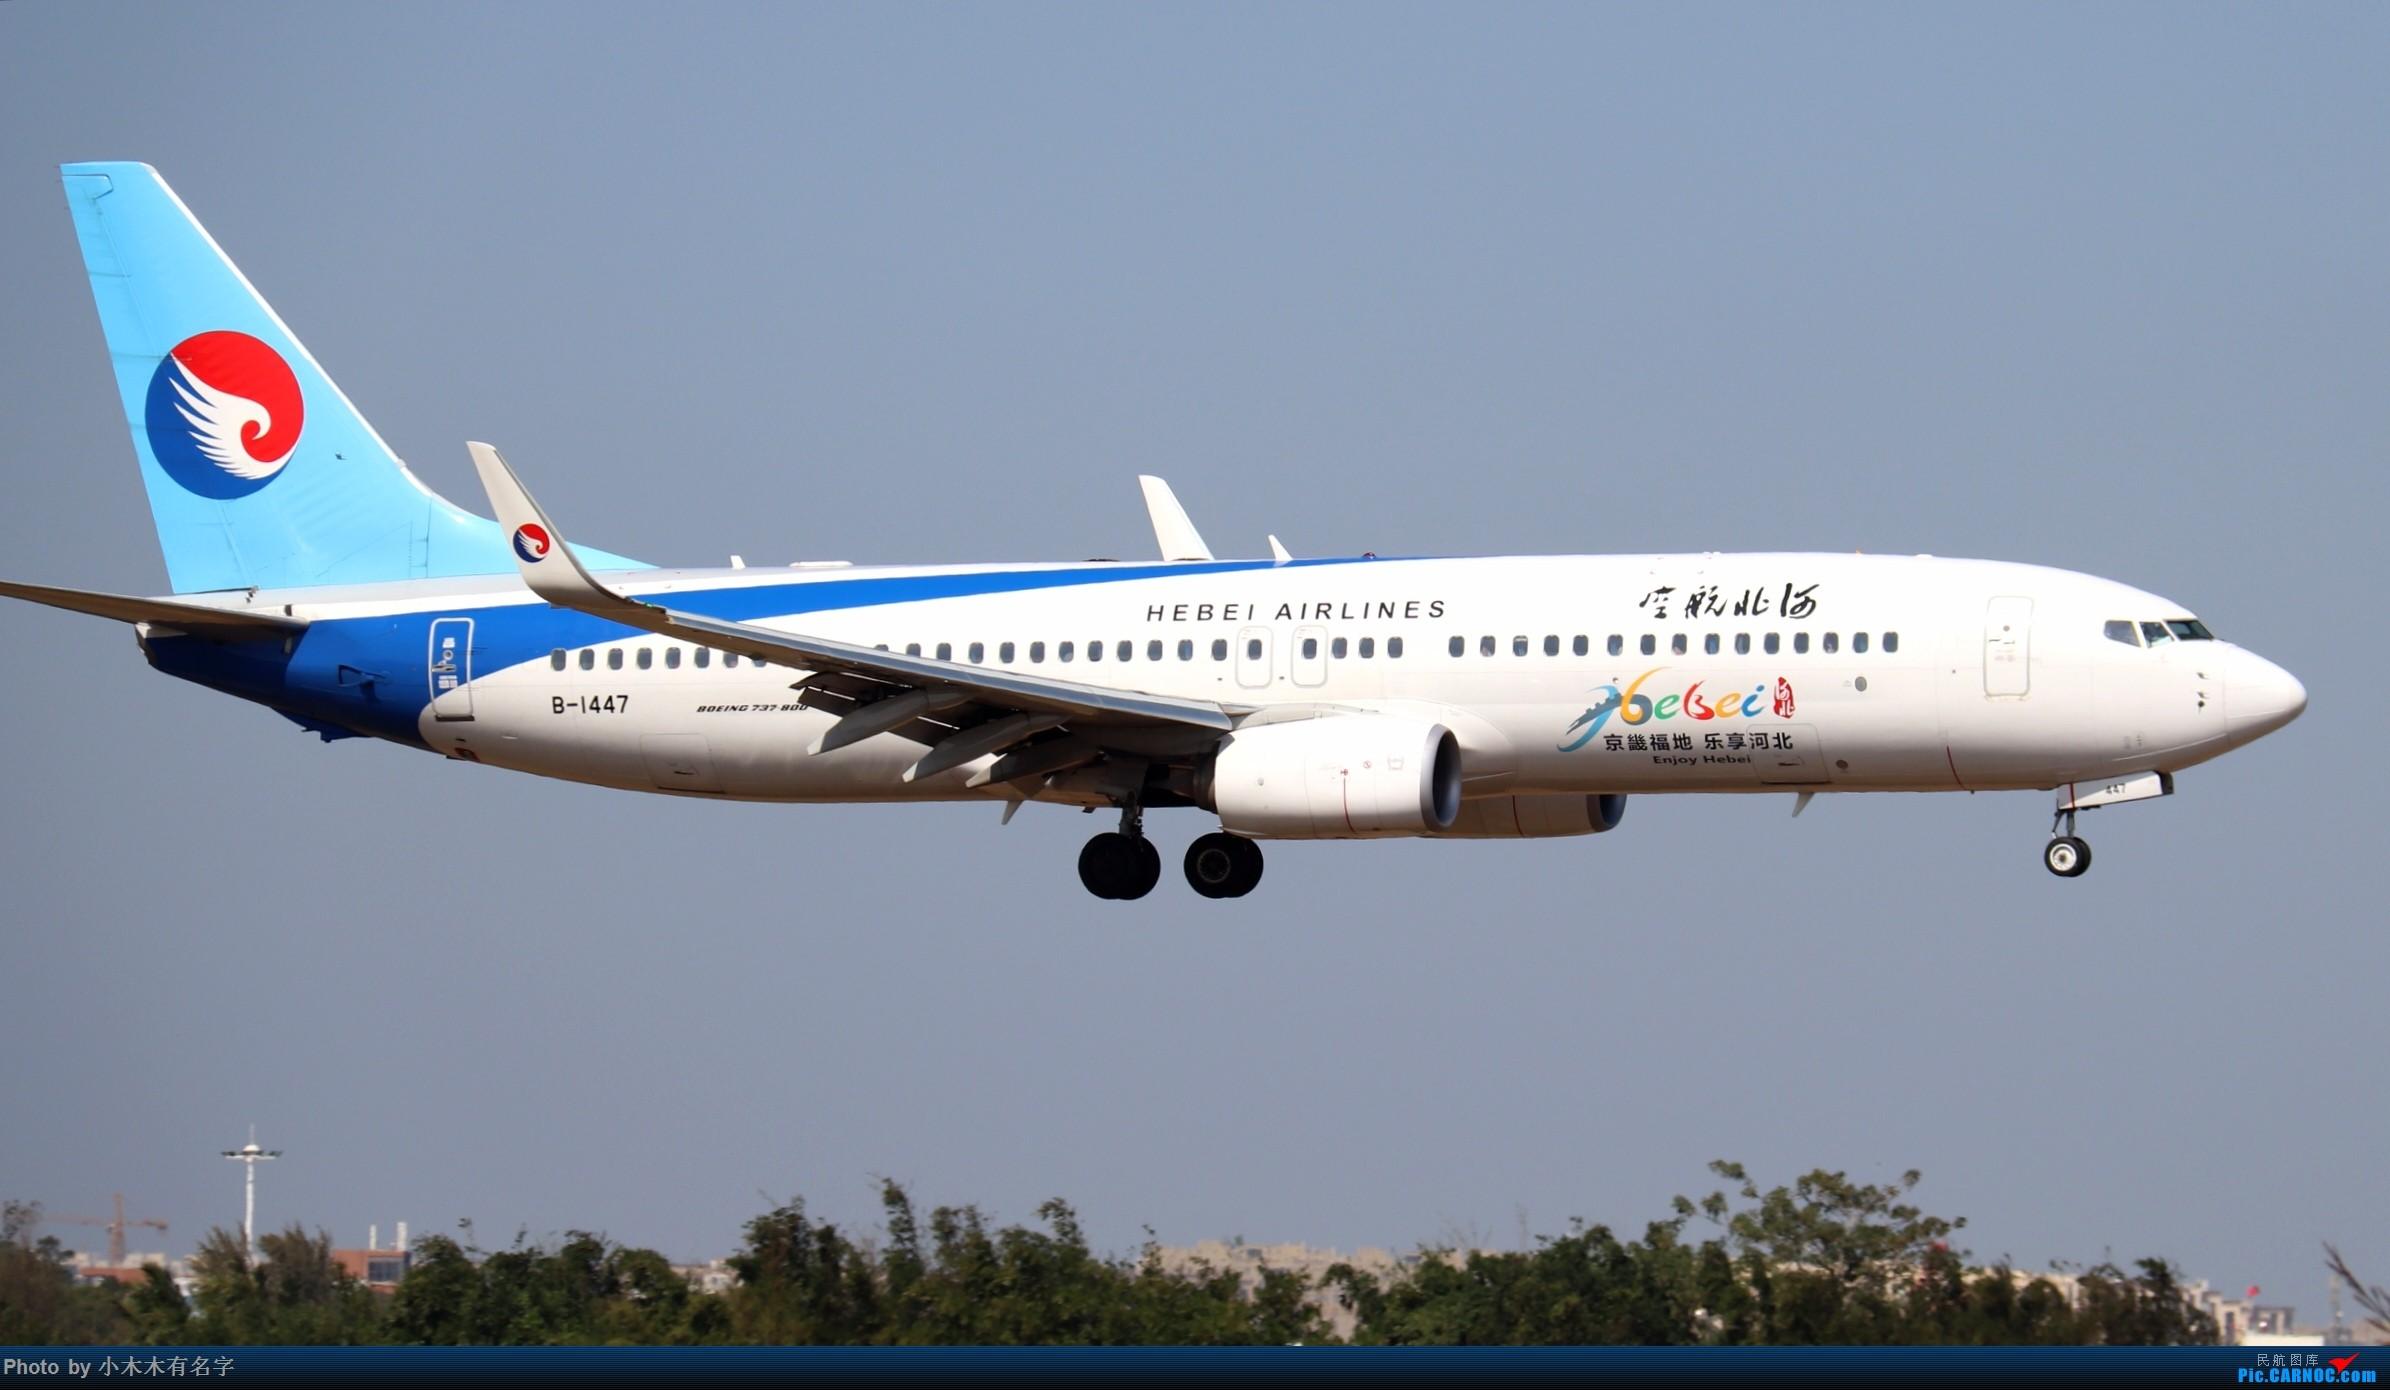 Re:[原创]2019冬天的海口美兰 BOEING 737-800 B-1447 中国海口美兰国际机场